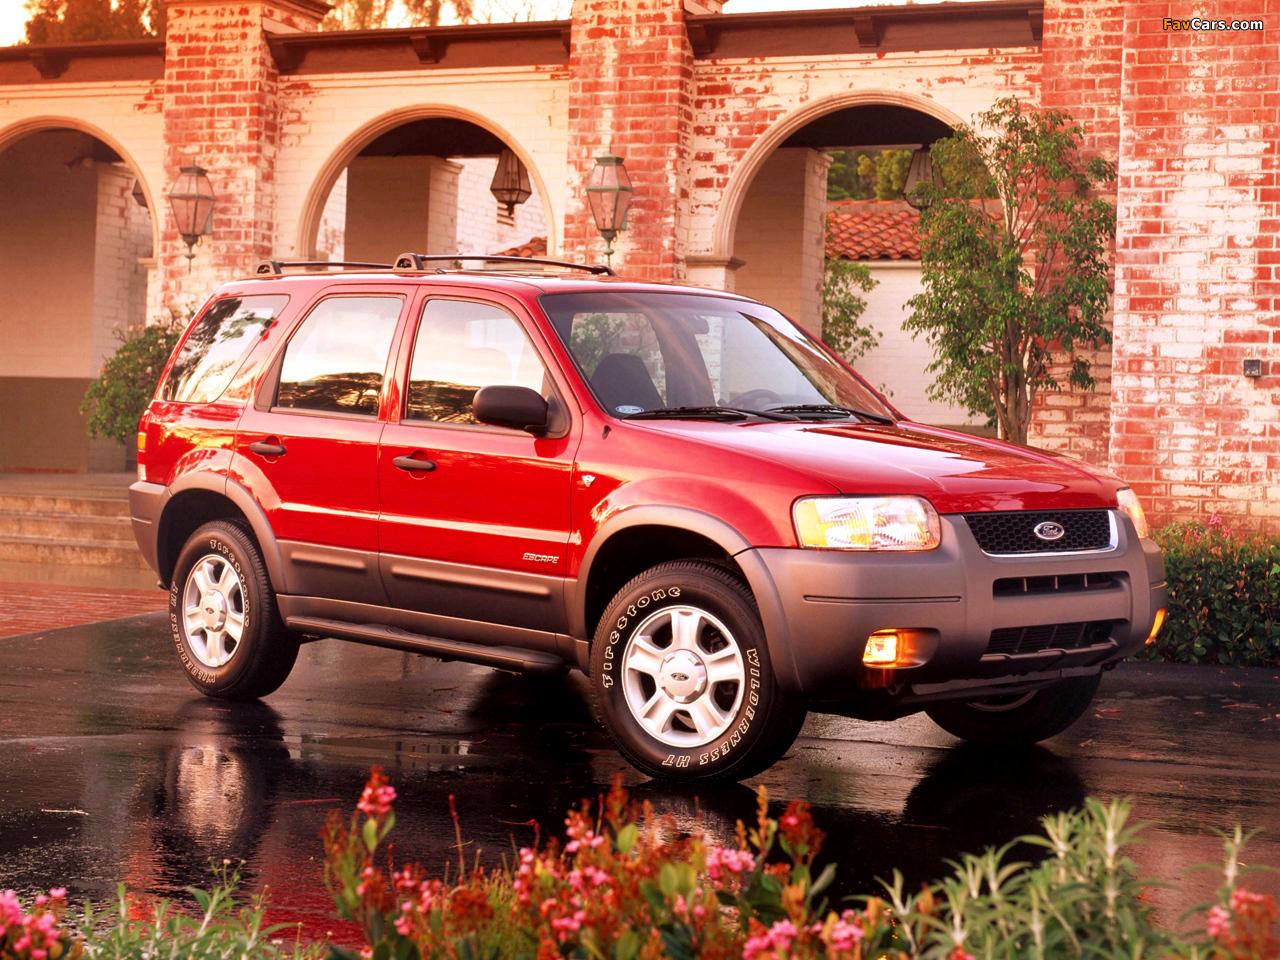 Форд Эскейп 2008 года, Так как Santa Fe(2008г) мой ...